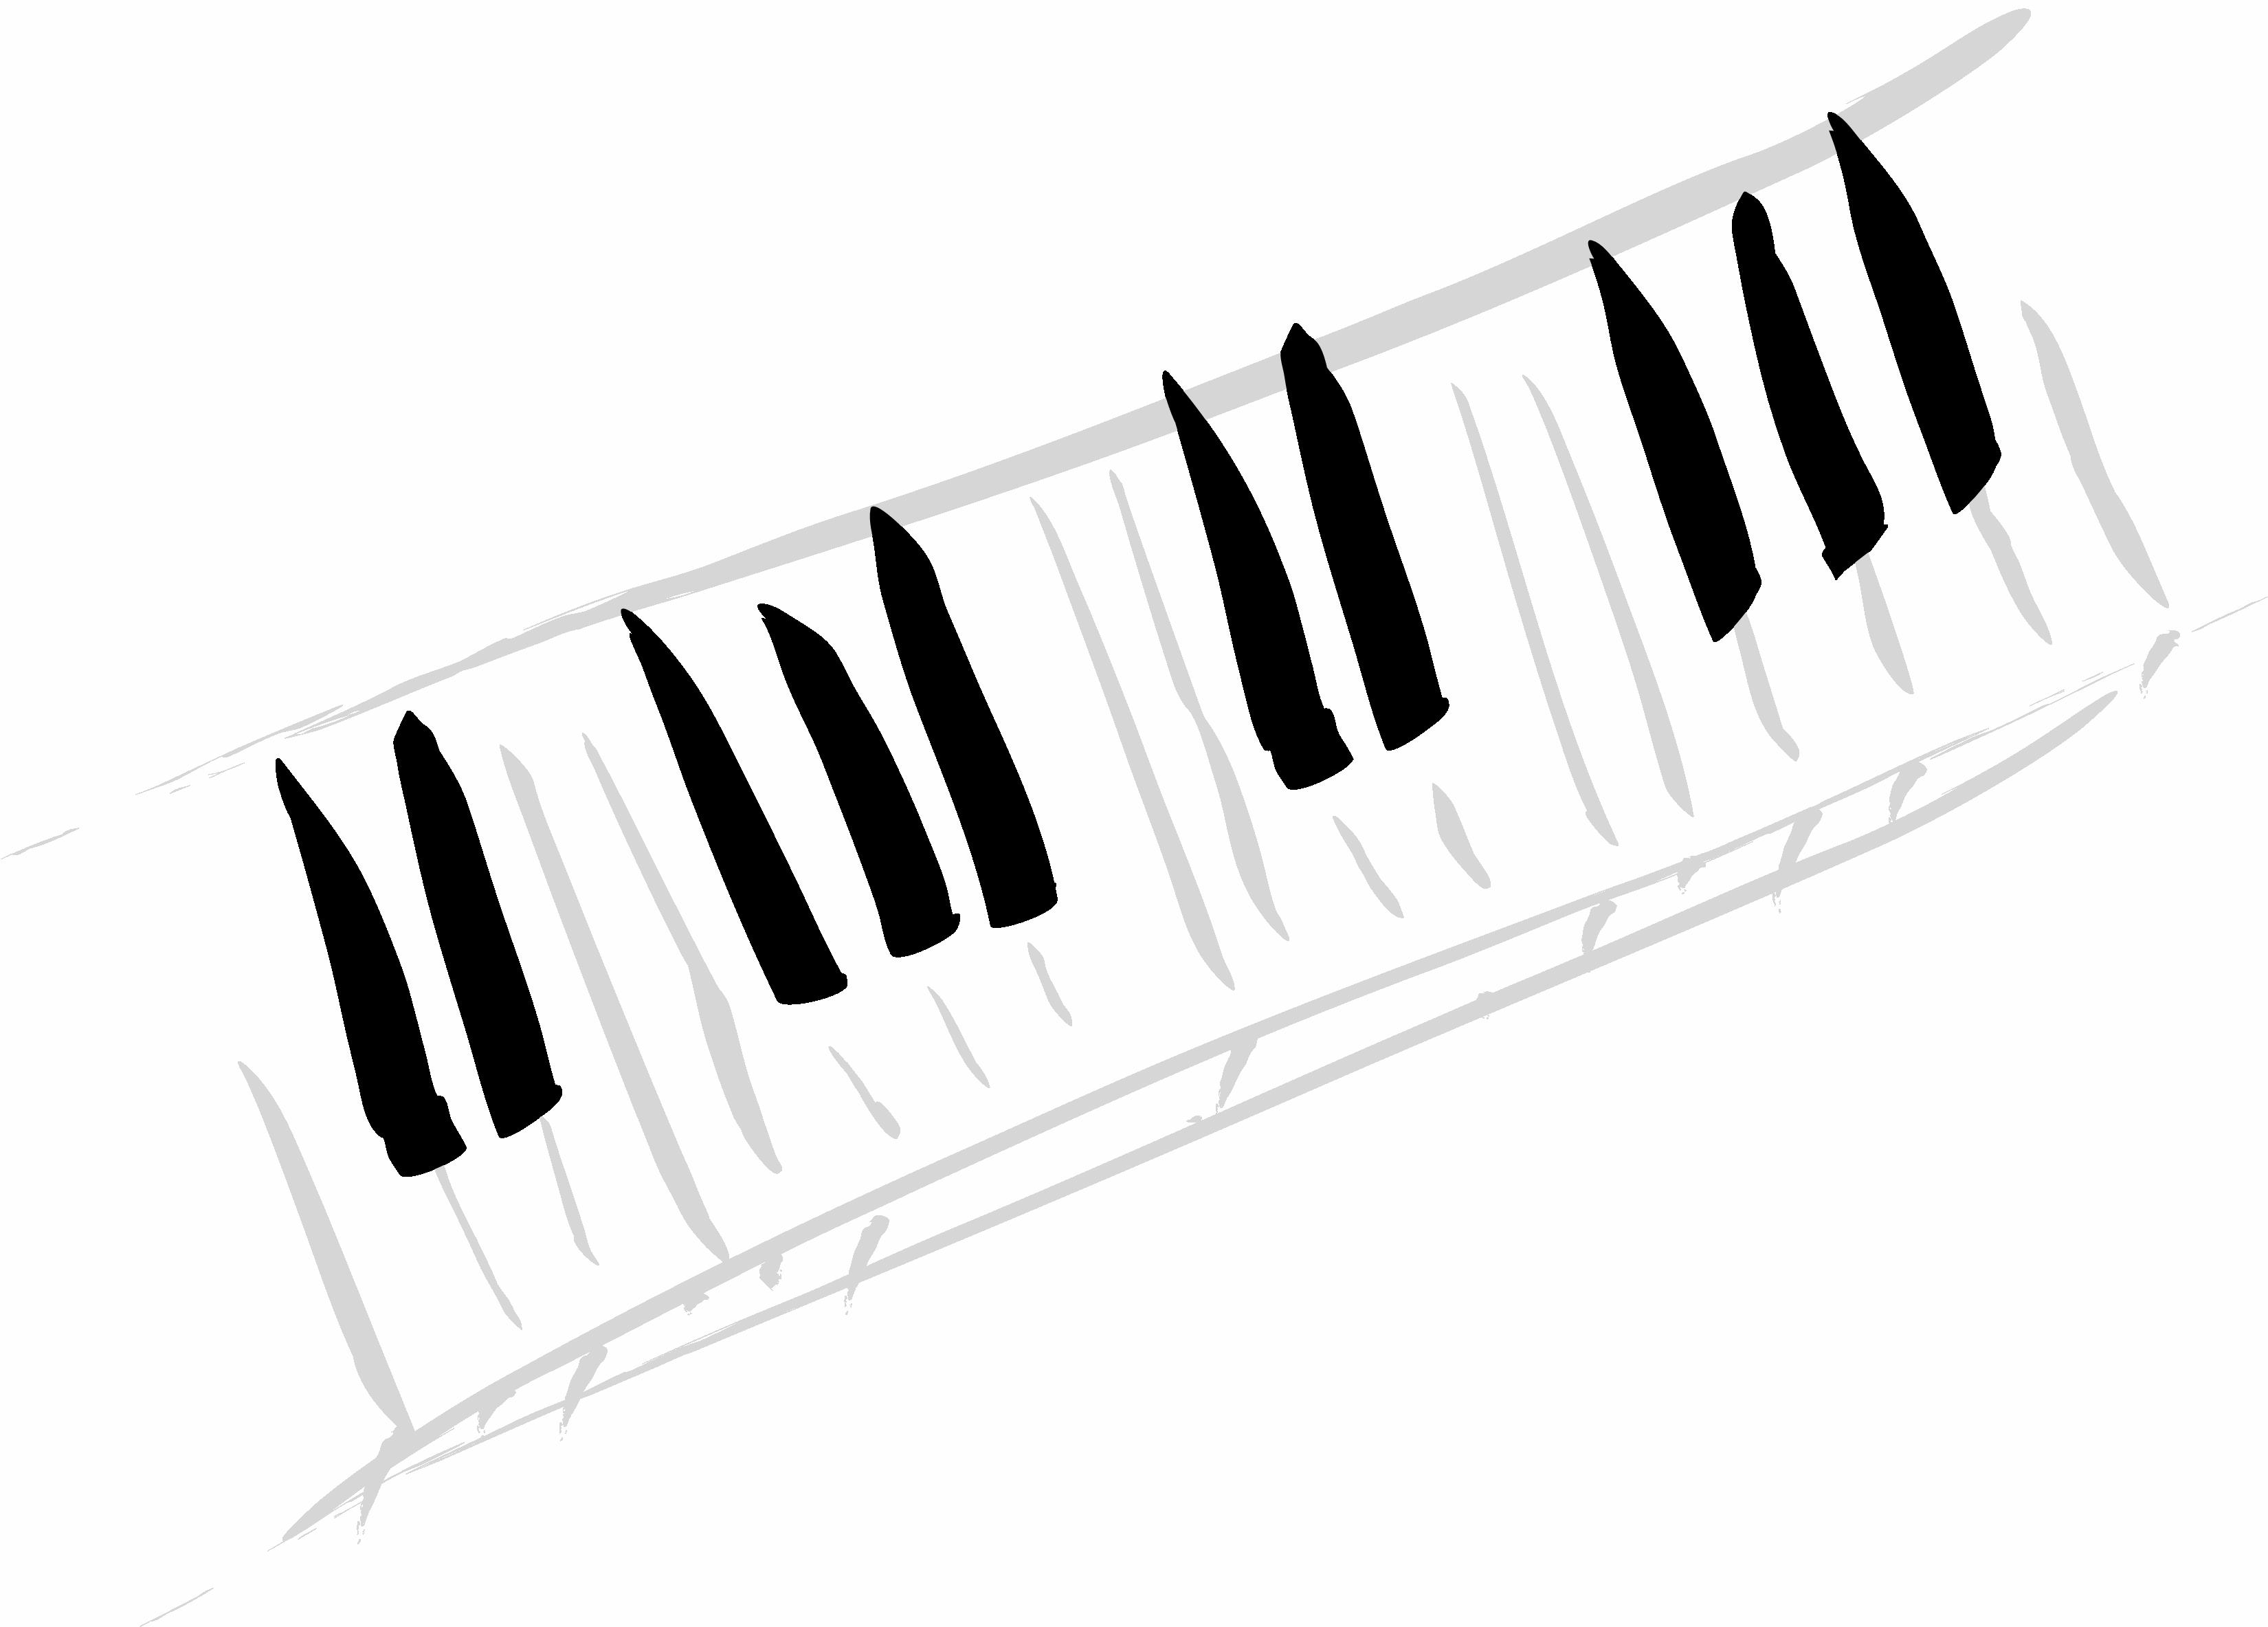 Piano musical clip art. Music clipart keyboard